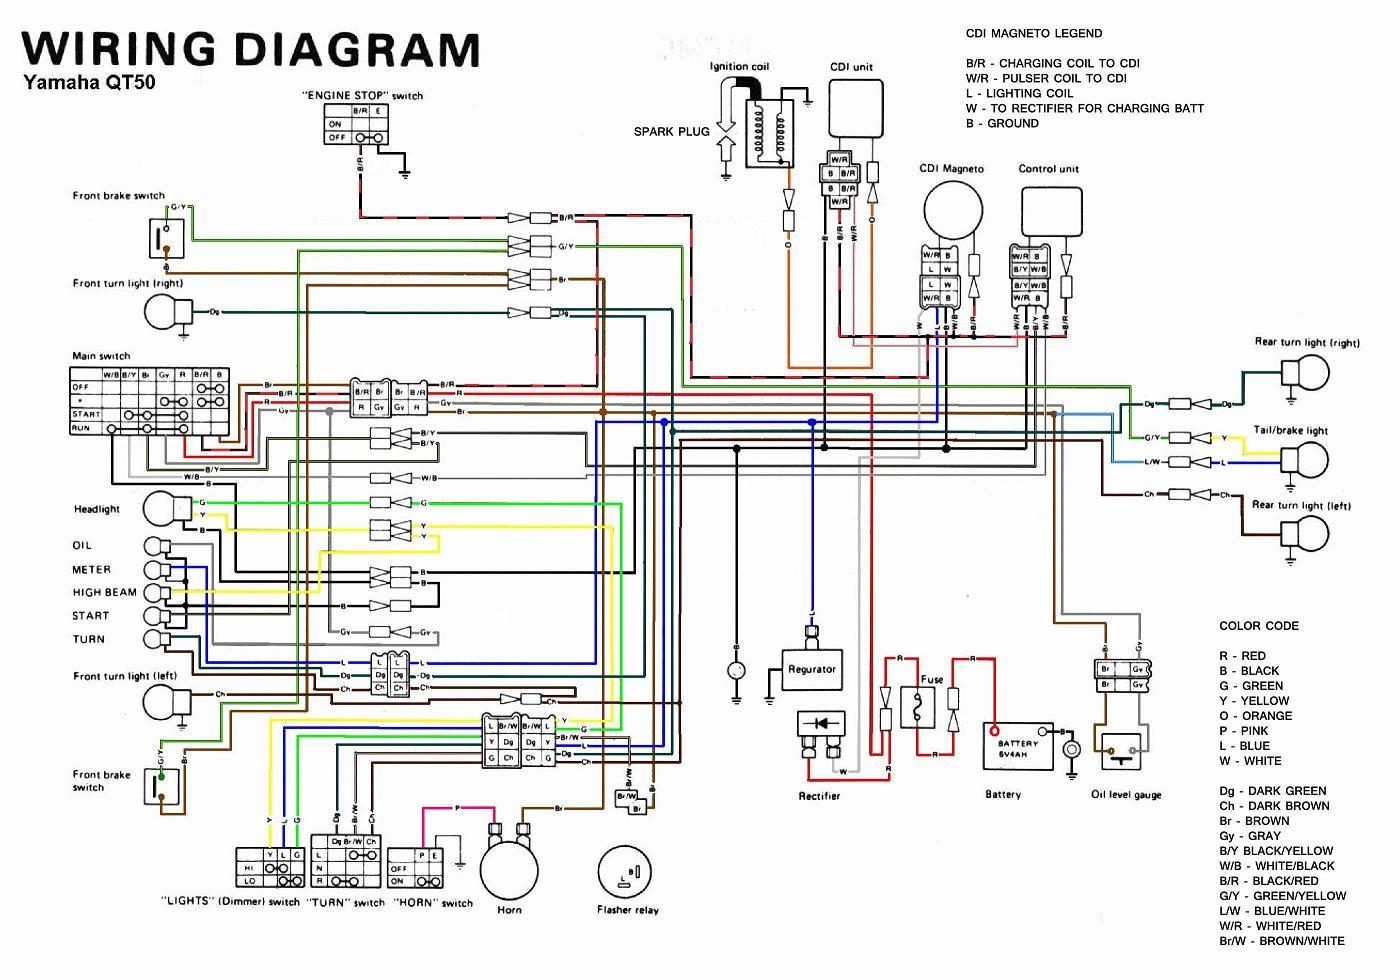 Image result for 1989 yamaha Zuma wiring diagram | 1989